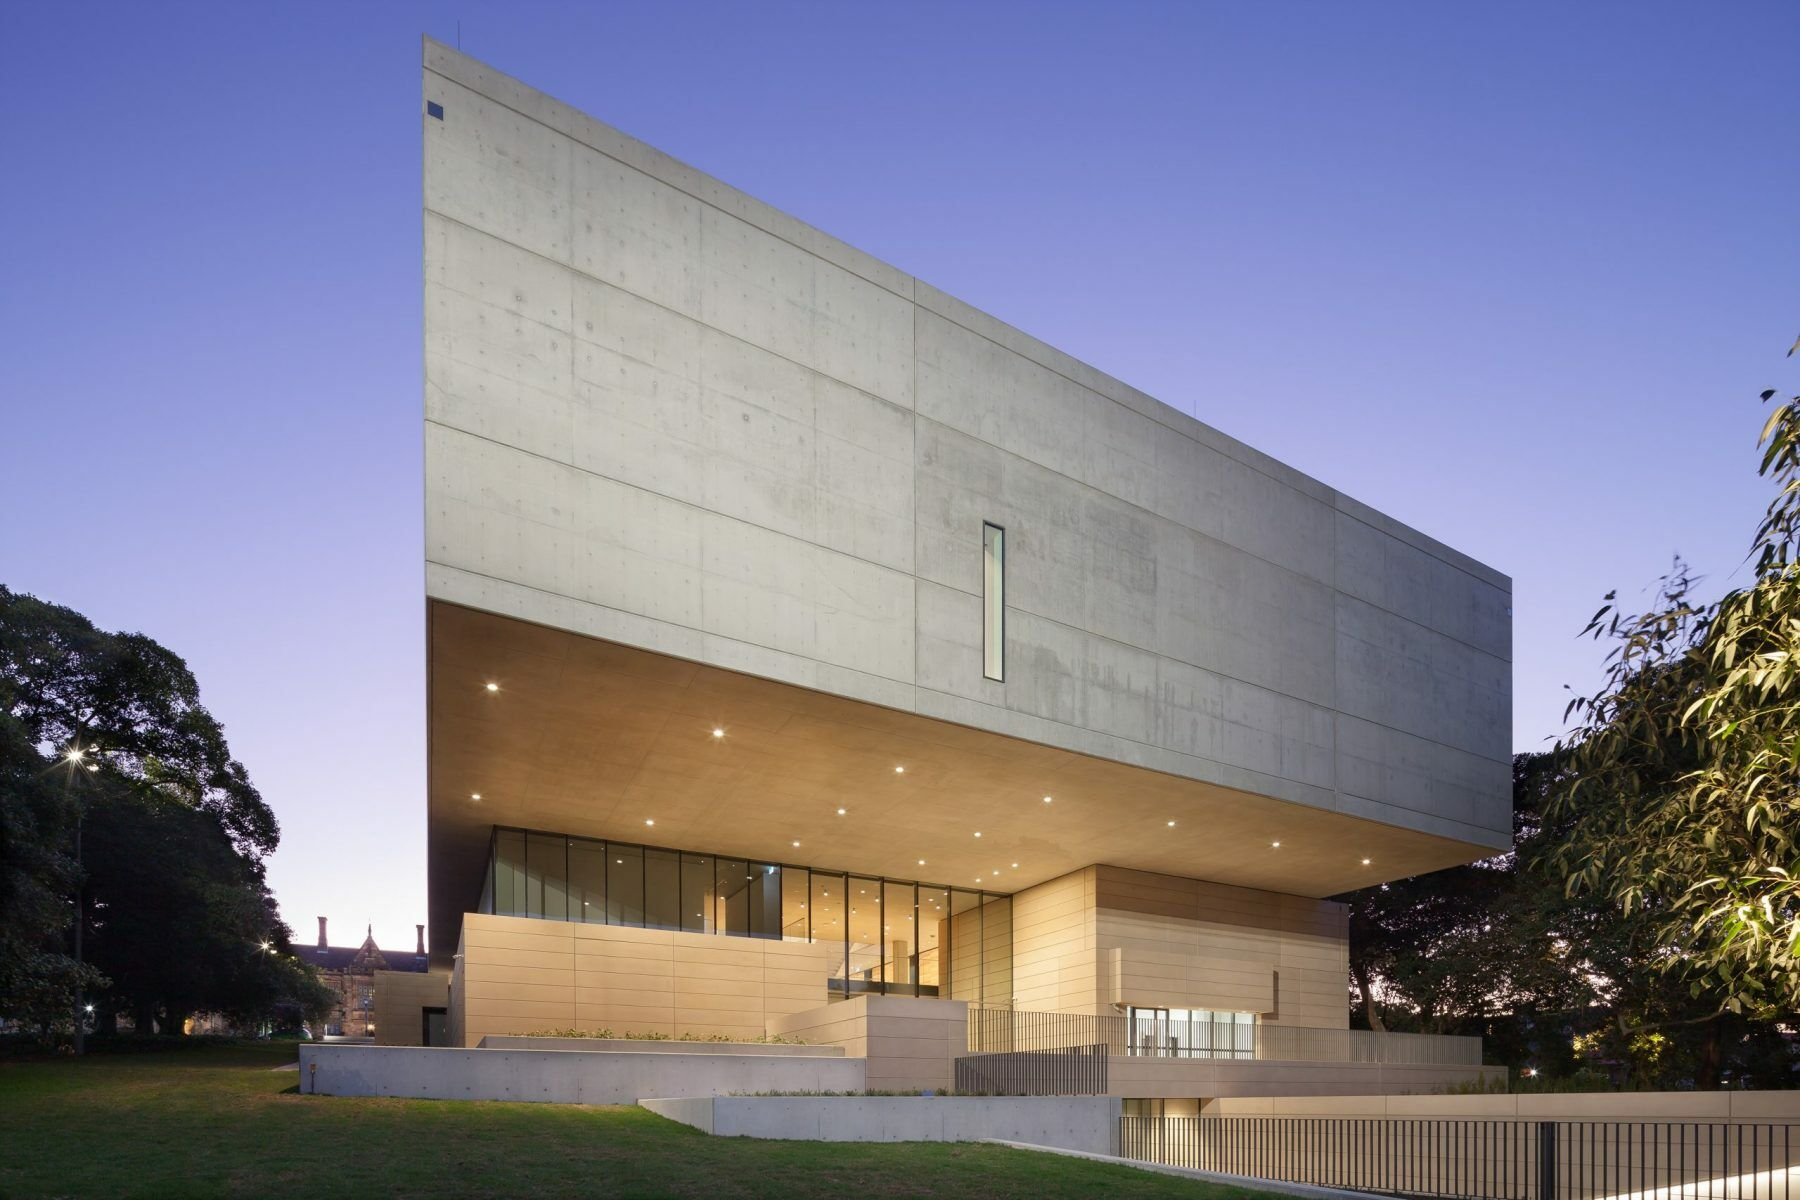 Chau Chak Wing Museum facade at Sydney University